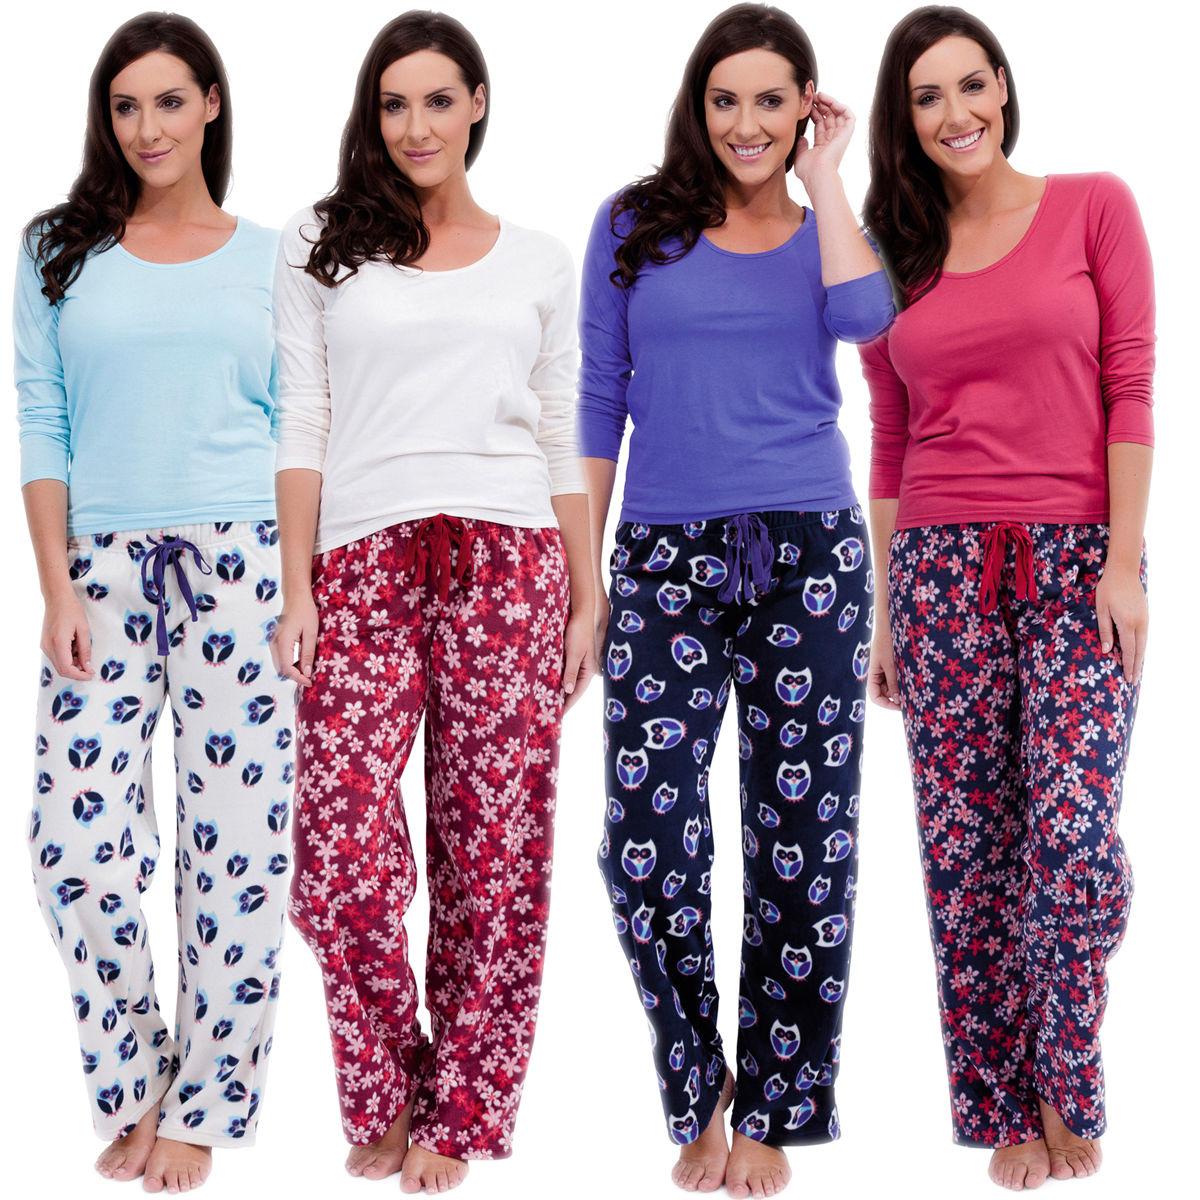 b0ad5902b8 Womens Warm Fleece Winter PJ Pyjama Set Night Wear PJ s Pyjamas Sets Ladies